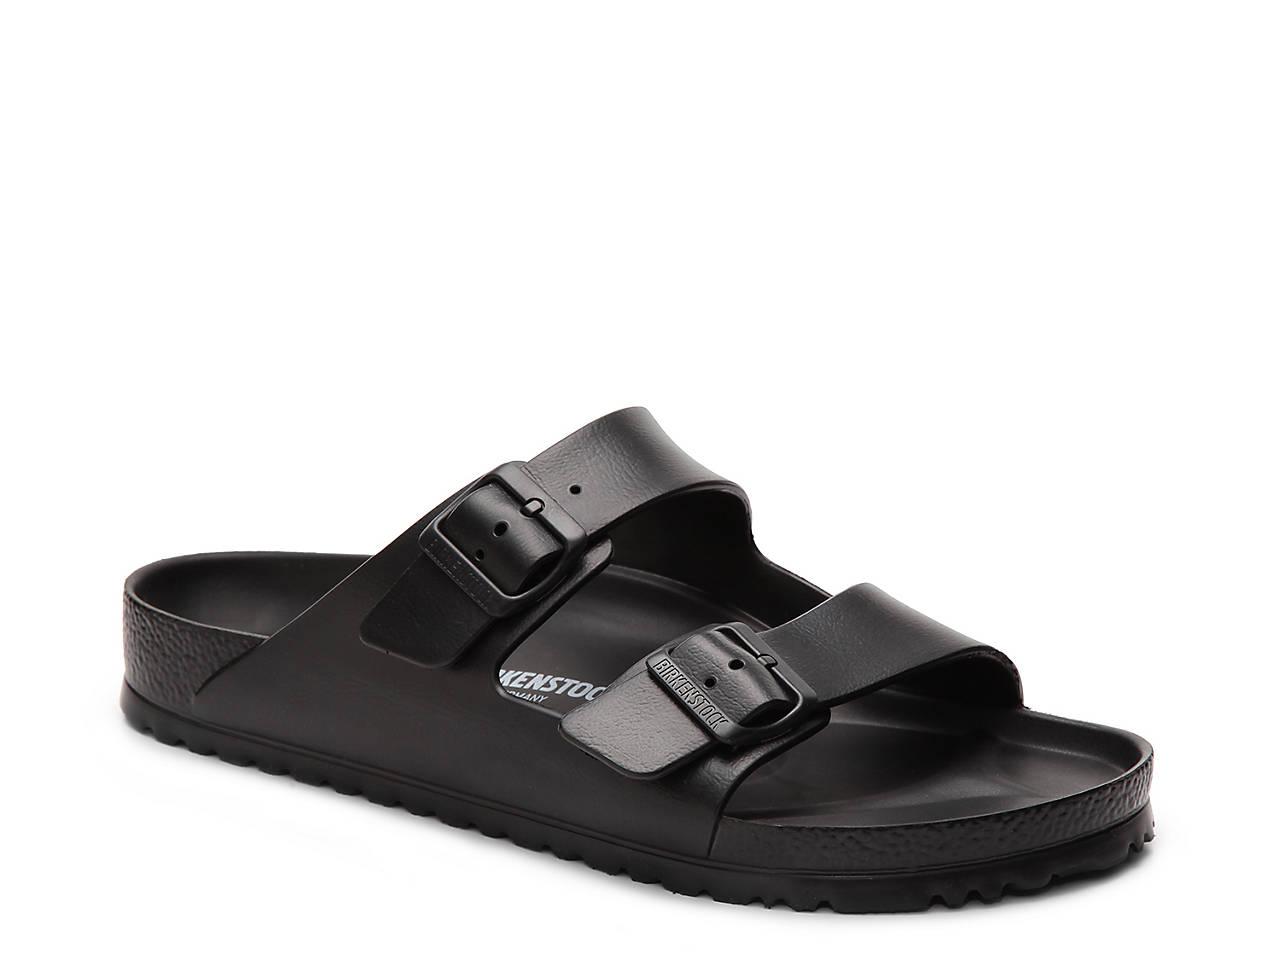 3c54a091974 Essentials Arizona Slide Sandal - Men's